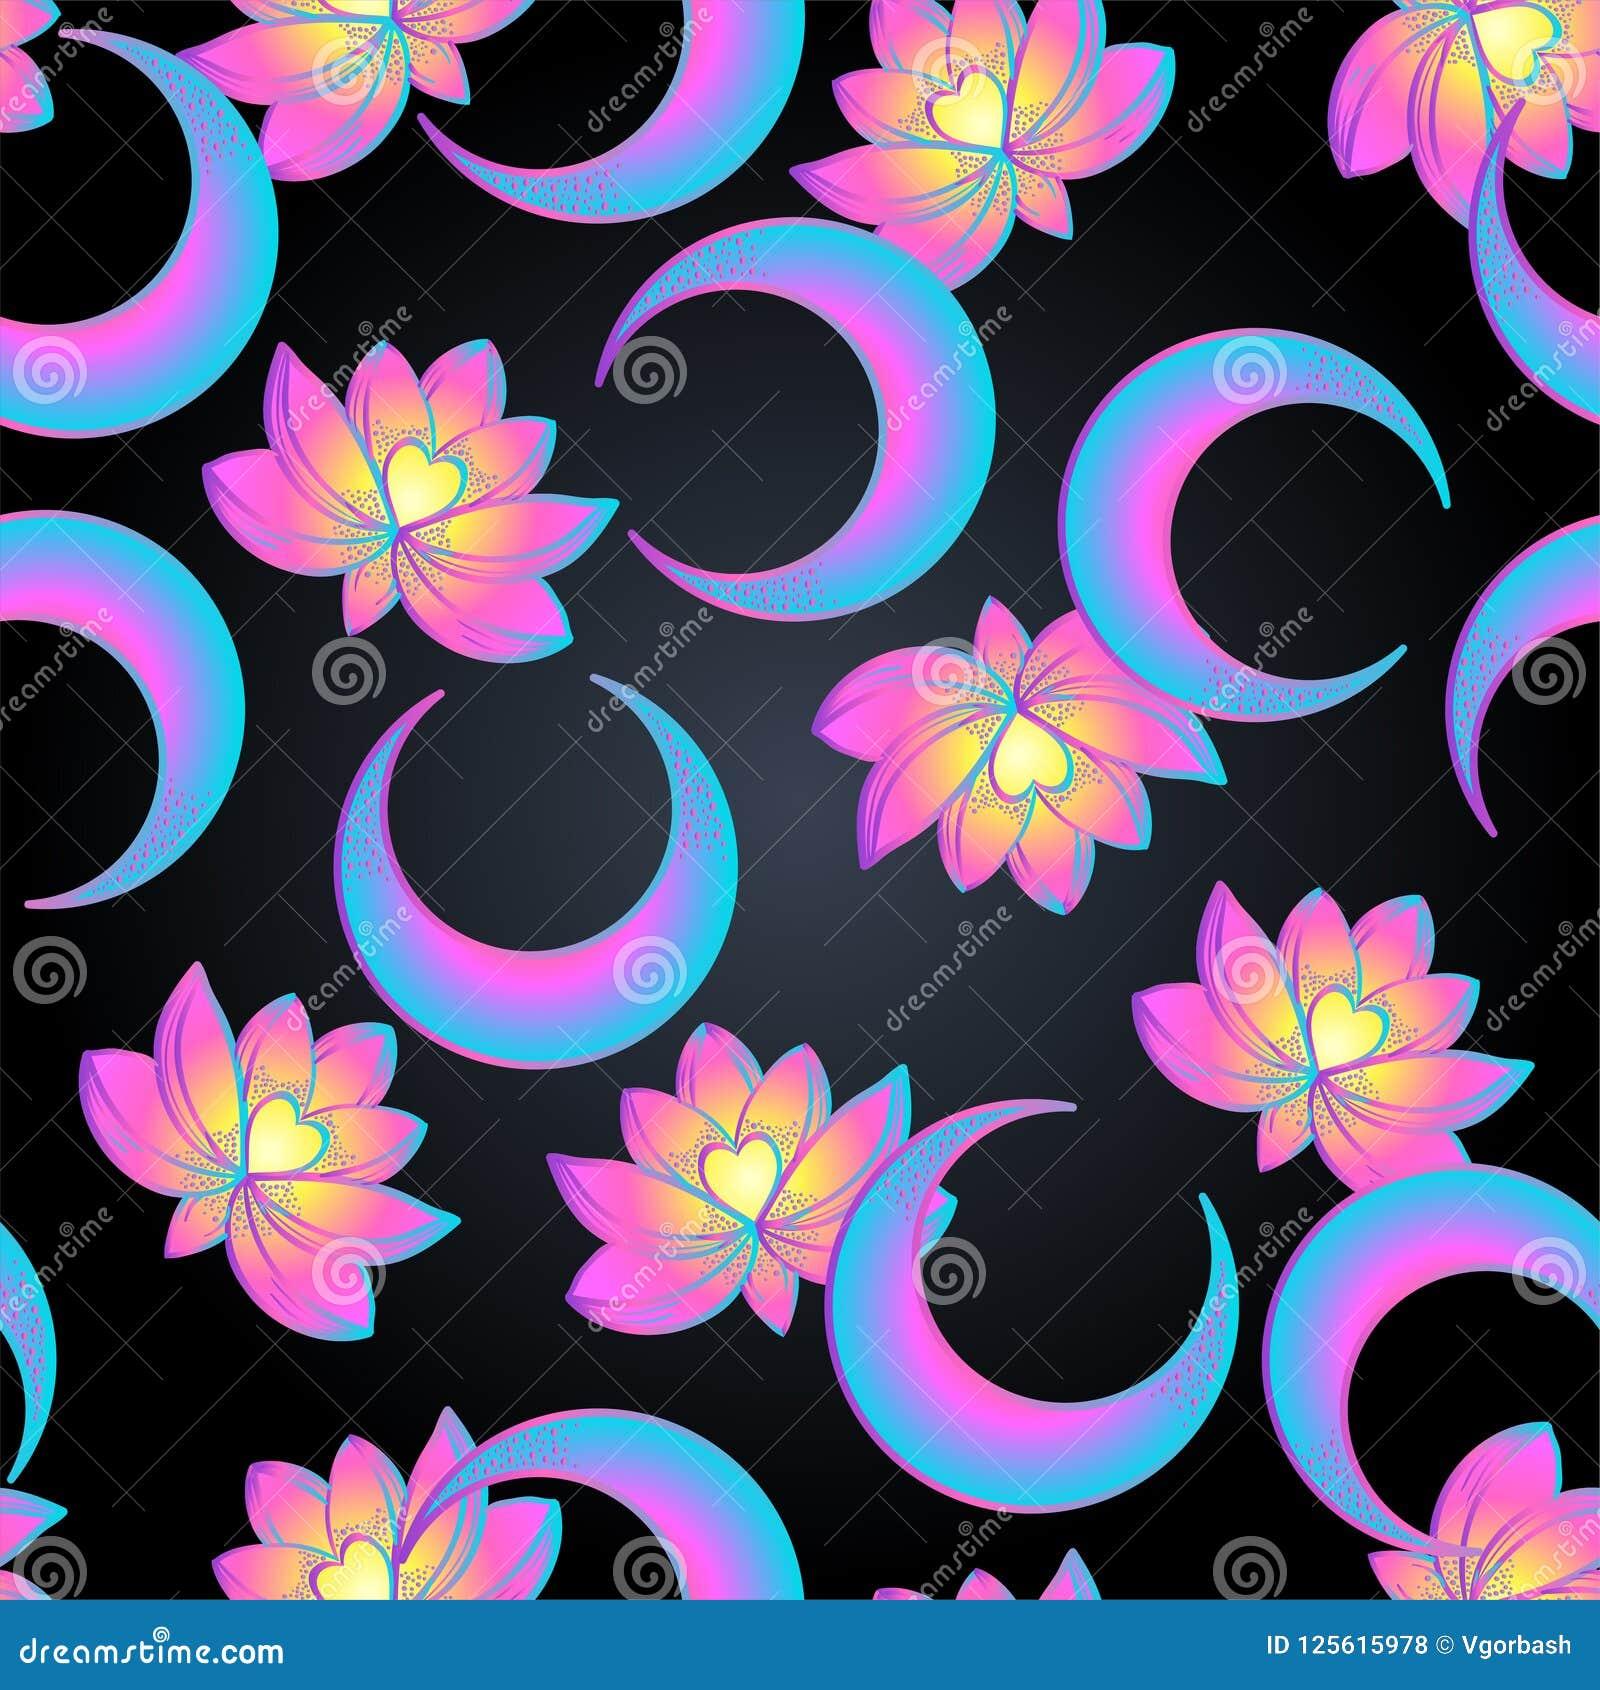 Lotus and sacred geometry seamless pattern unamole hindu symbo download lotus and sacred geometry seamless pattern unamole hindu symbo stock vector illustration mightylinksfo